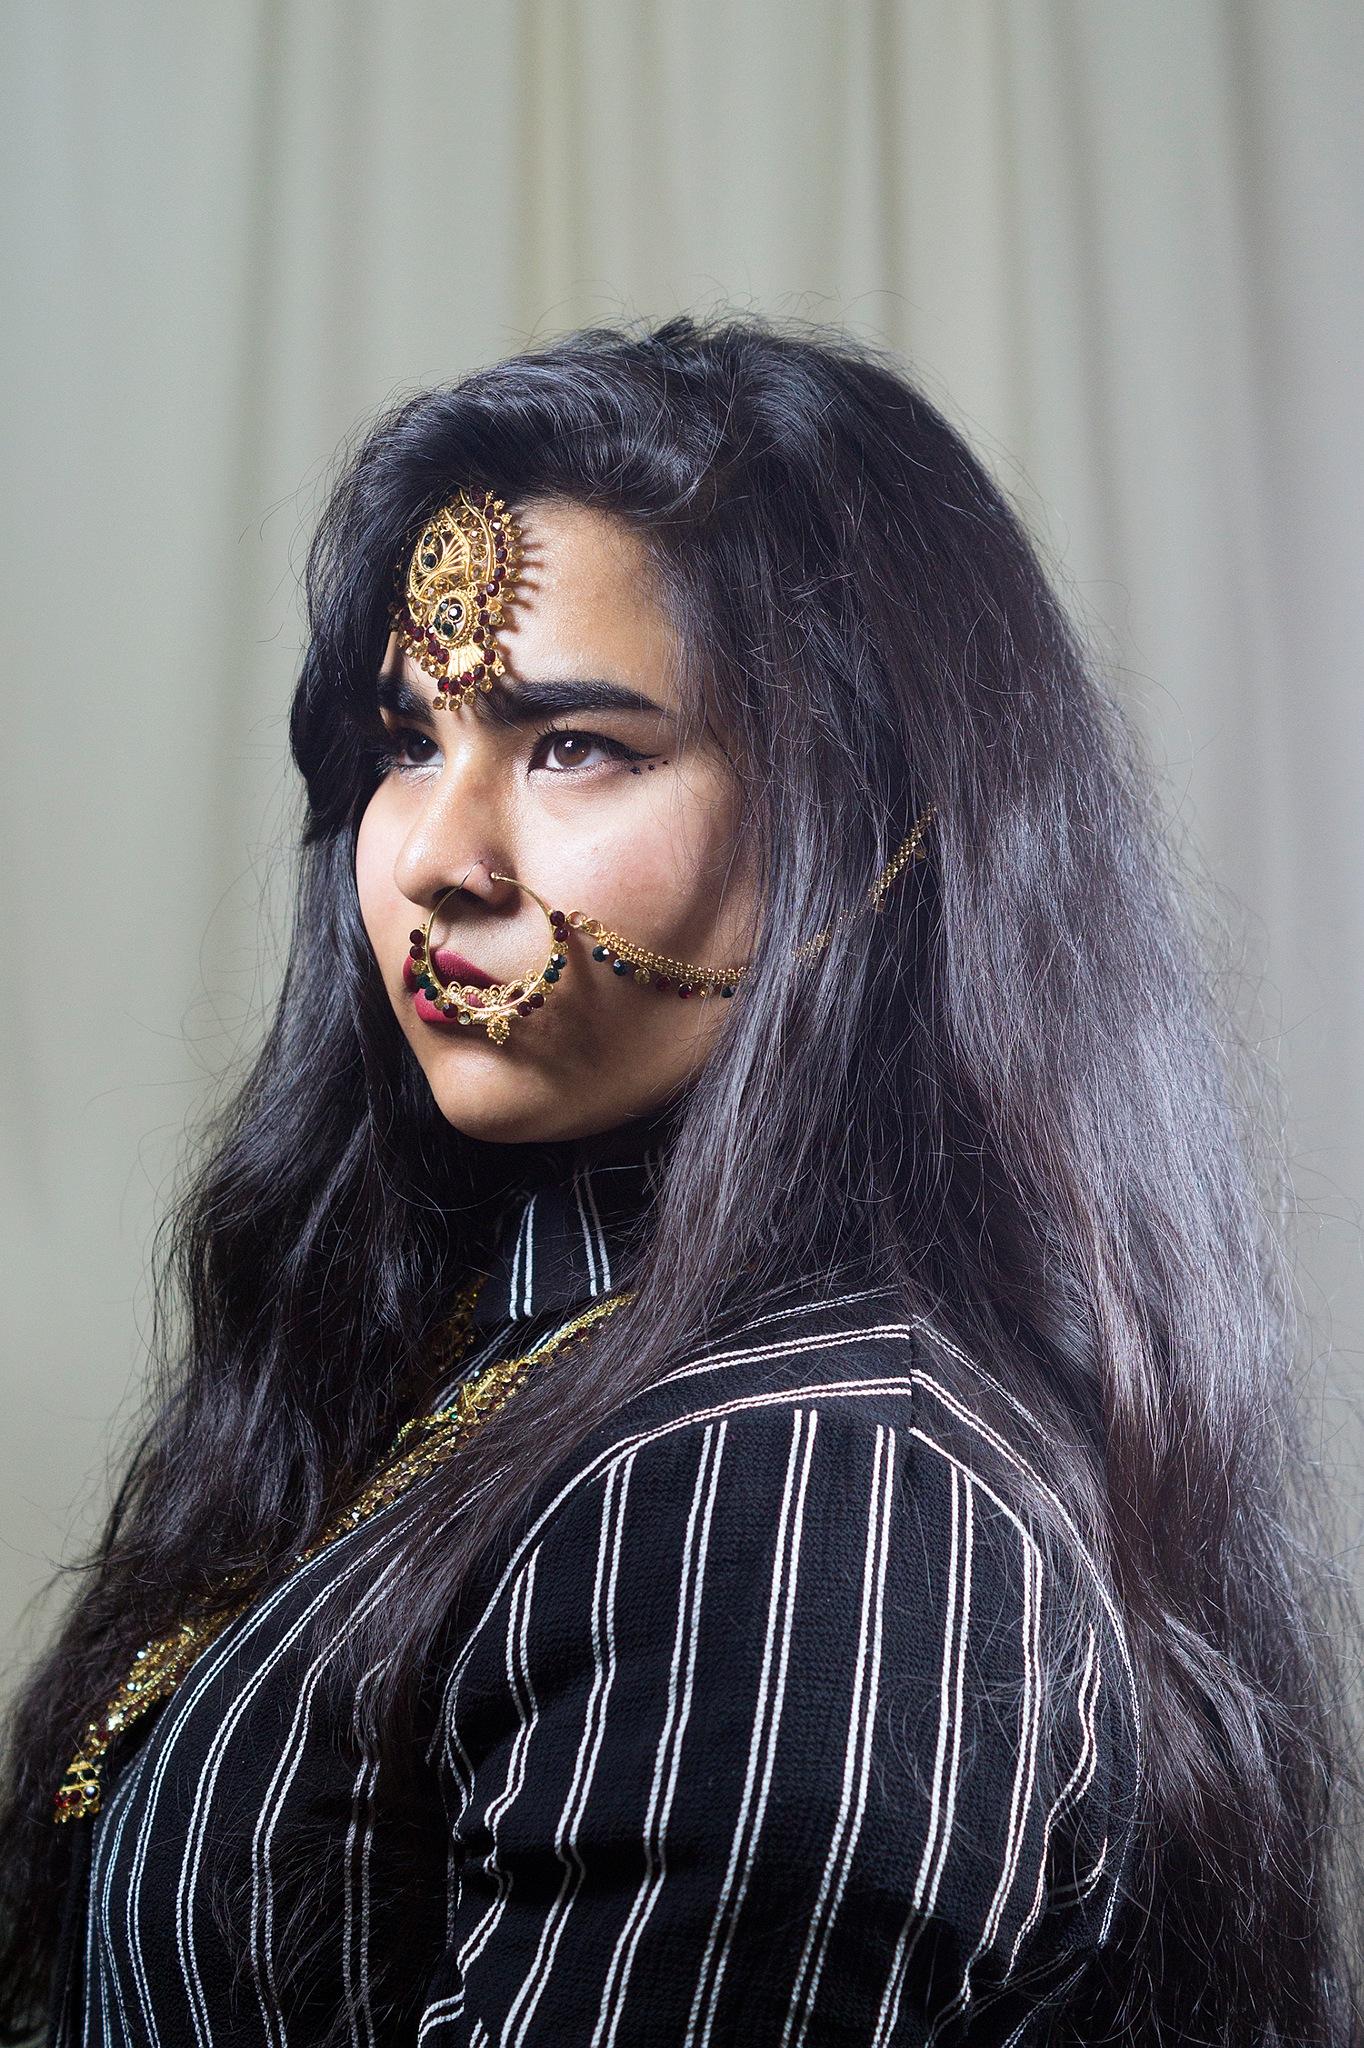 Self Portrait by Syeda Rosina Begum